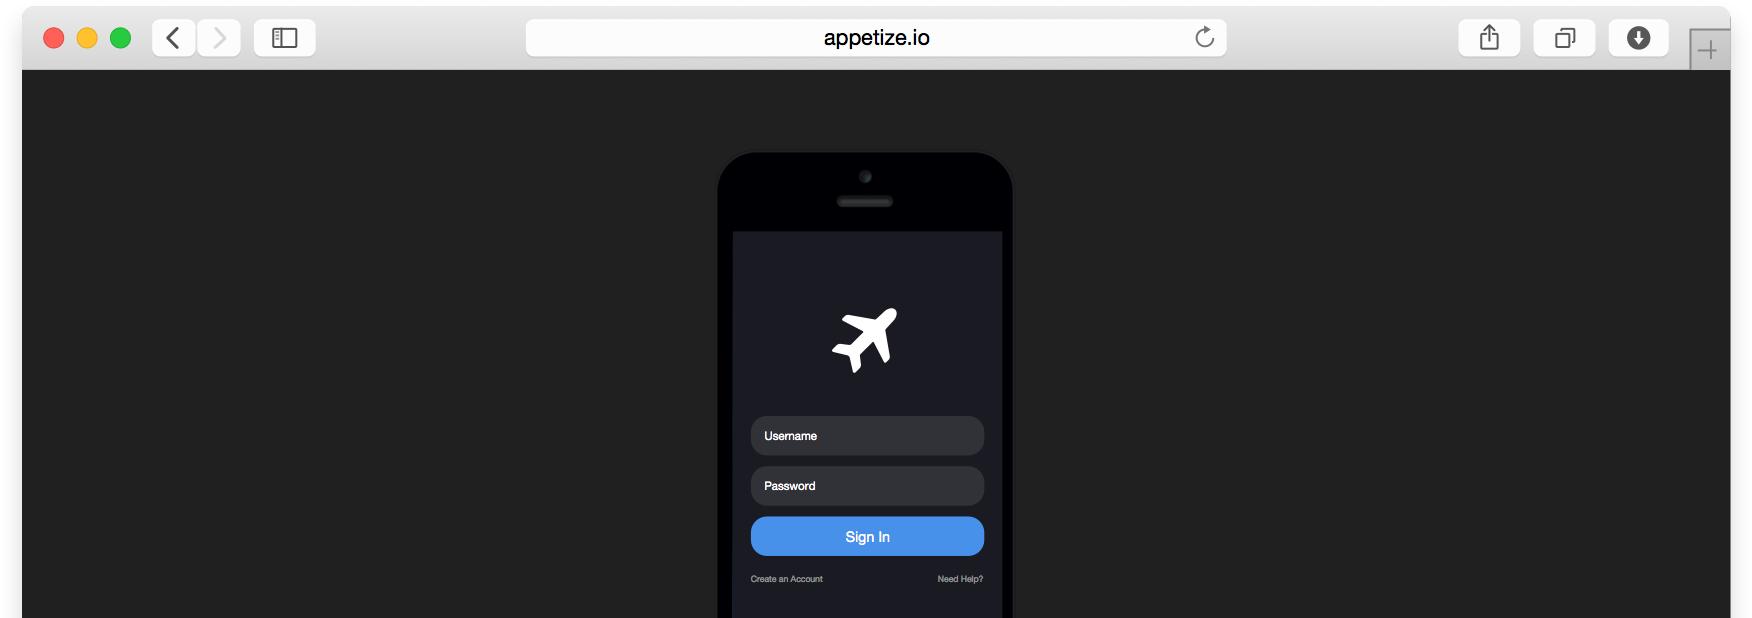 test app in browser